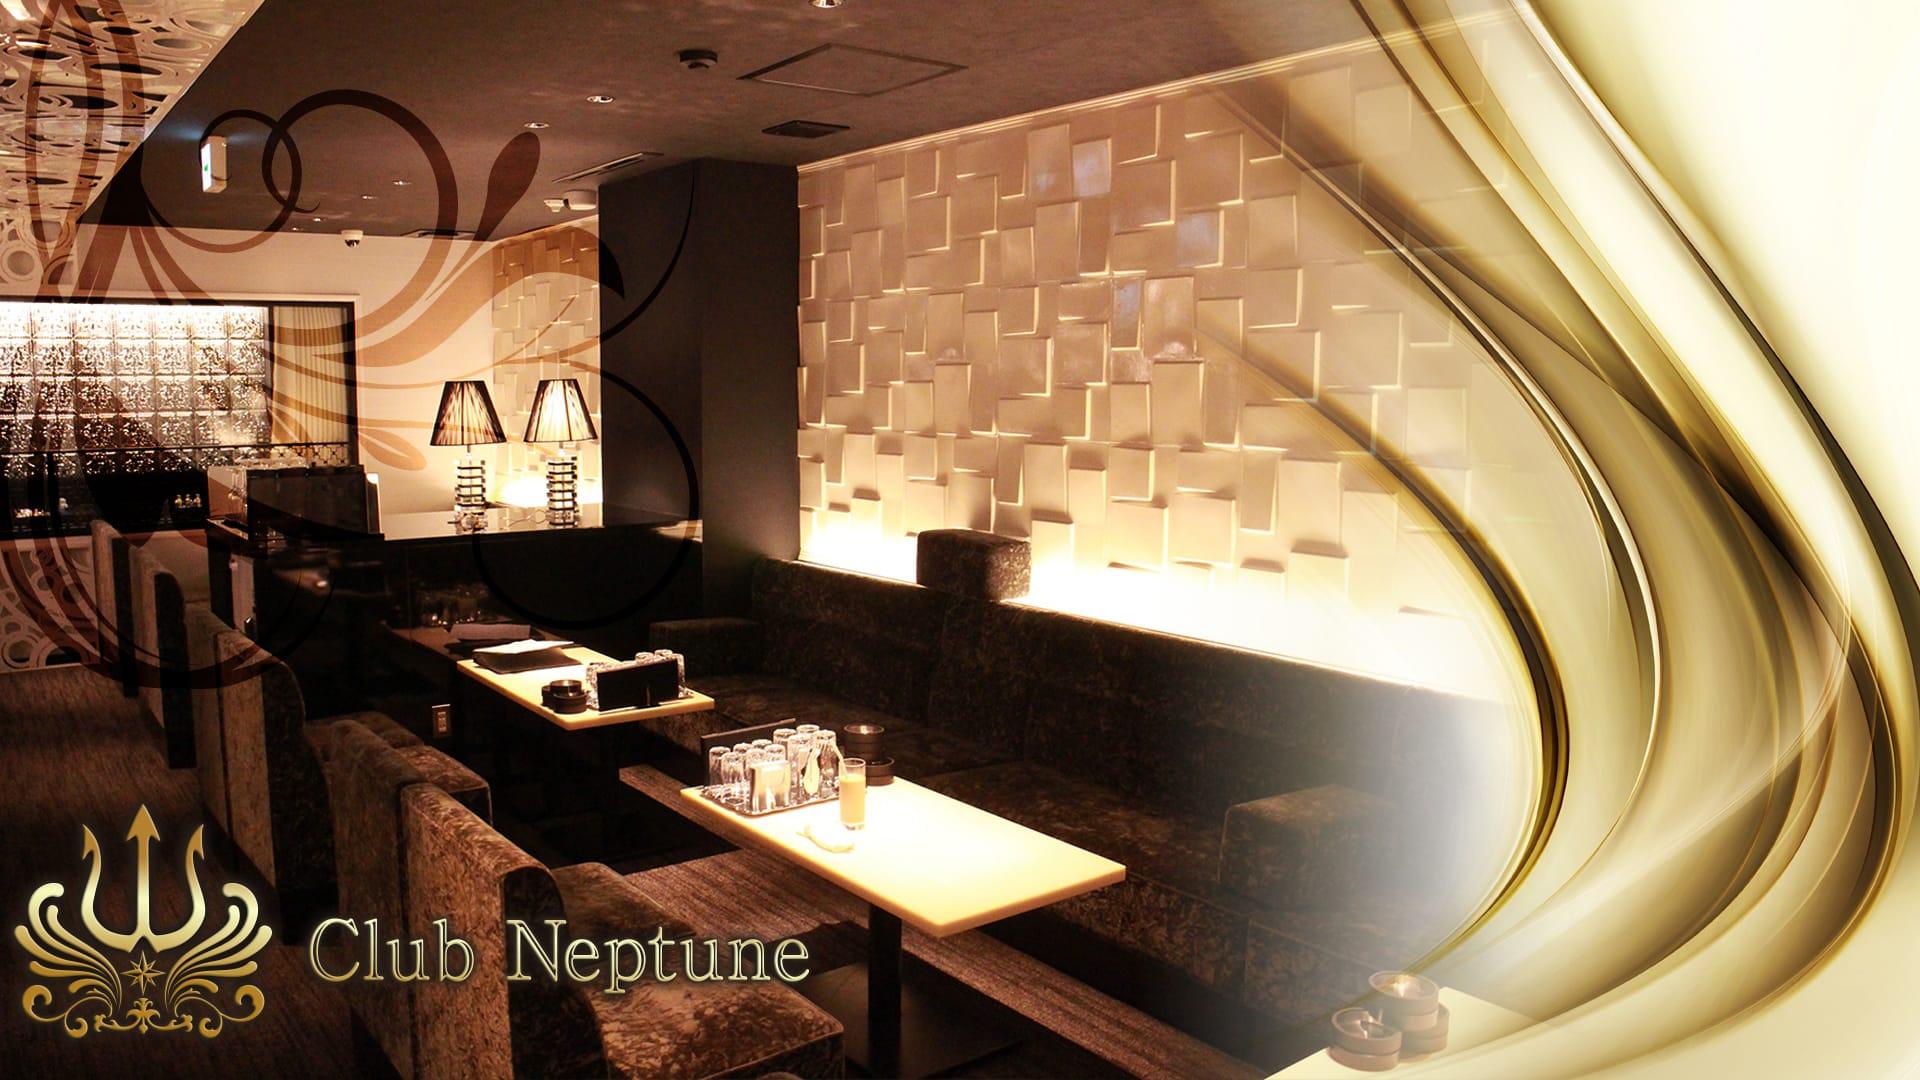 Club Neptune(ネプチューン) 難波キャバクラ TOP画像